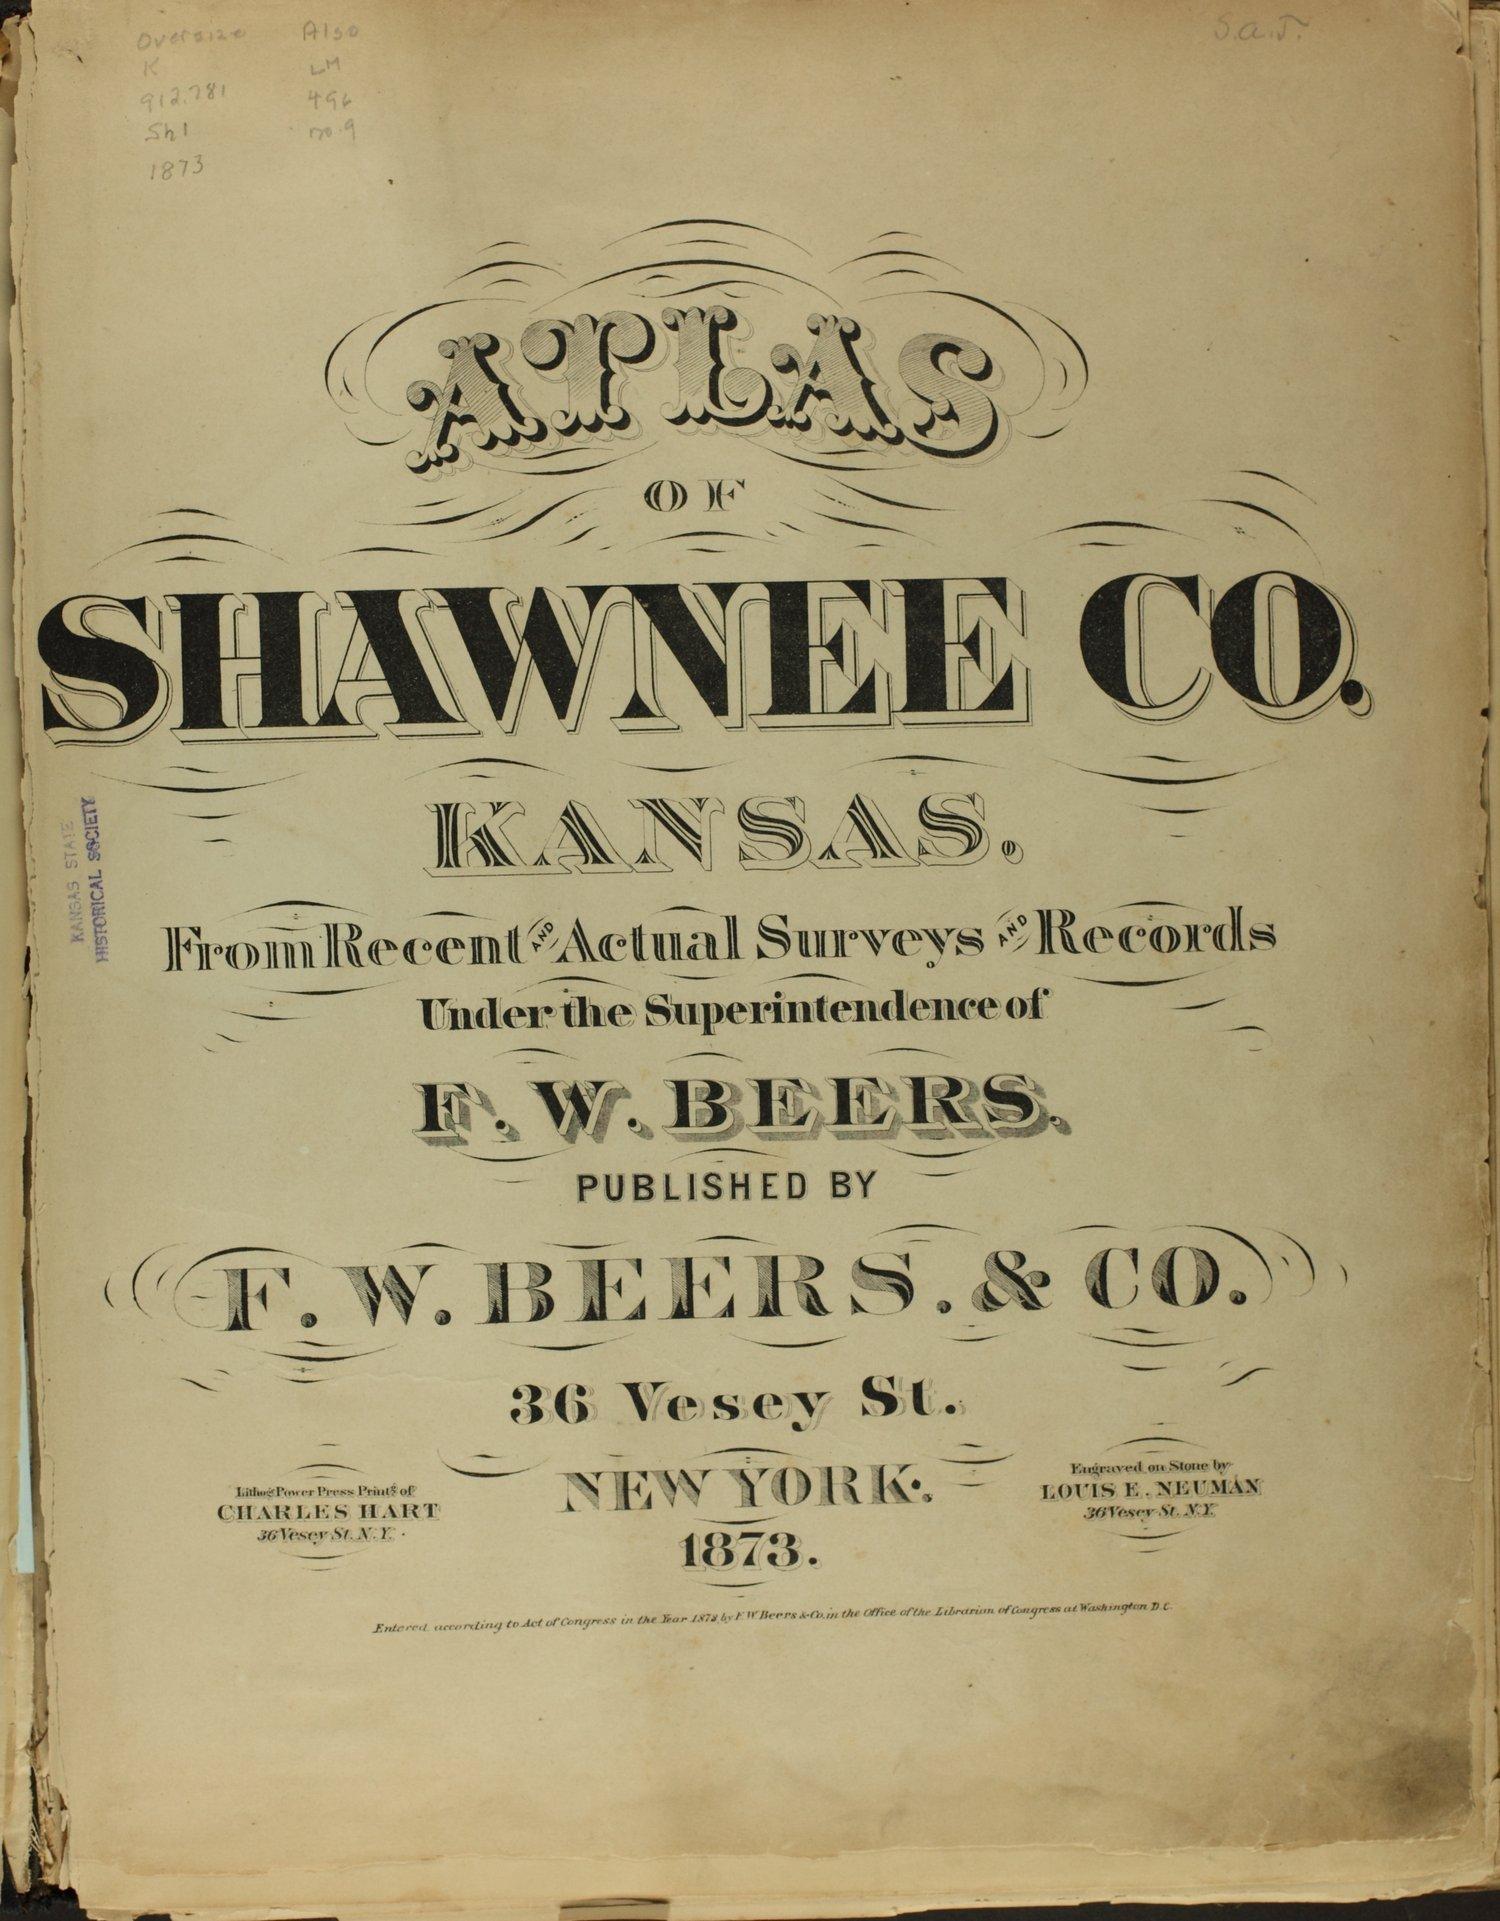 Atlas of Shawnee County, Kansas - Title Page